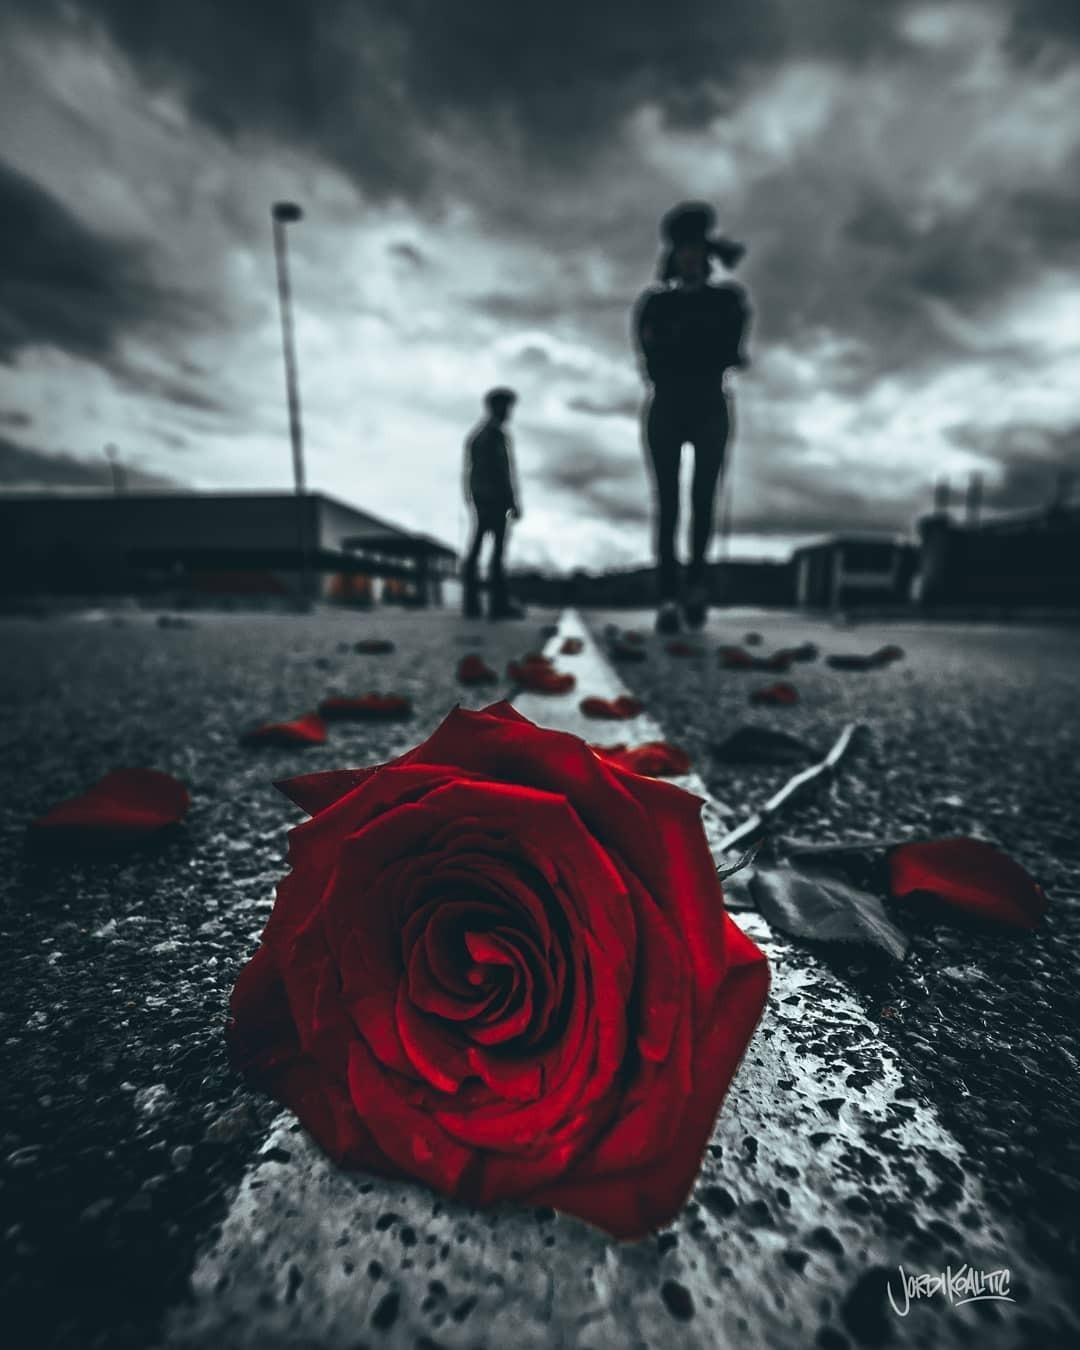 Фото Красная роза лежит на дороге, на втором плане парень, уходящий от девушки, by Jordi Koalitic